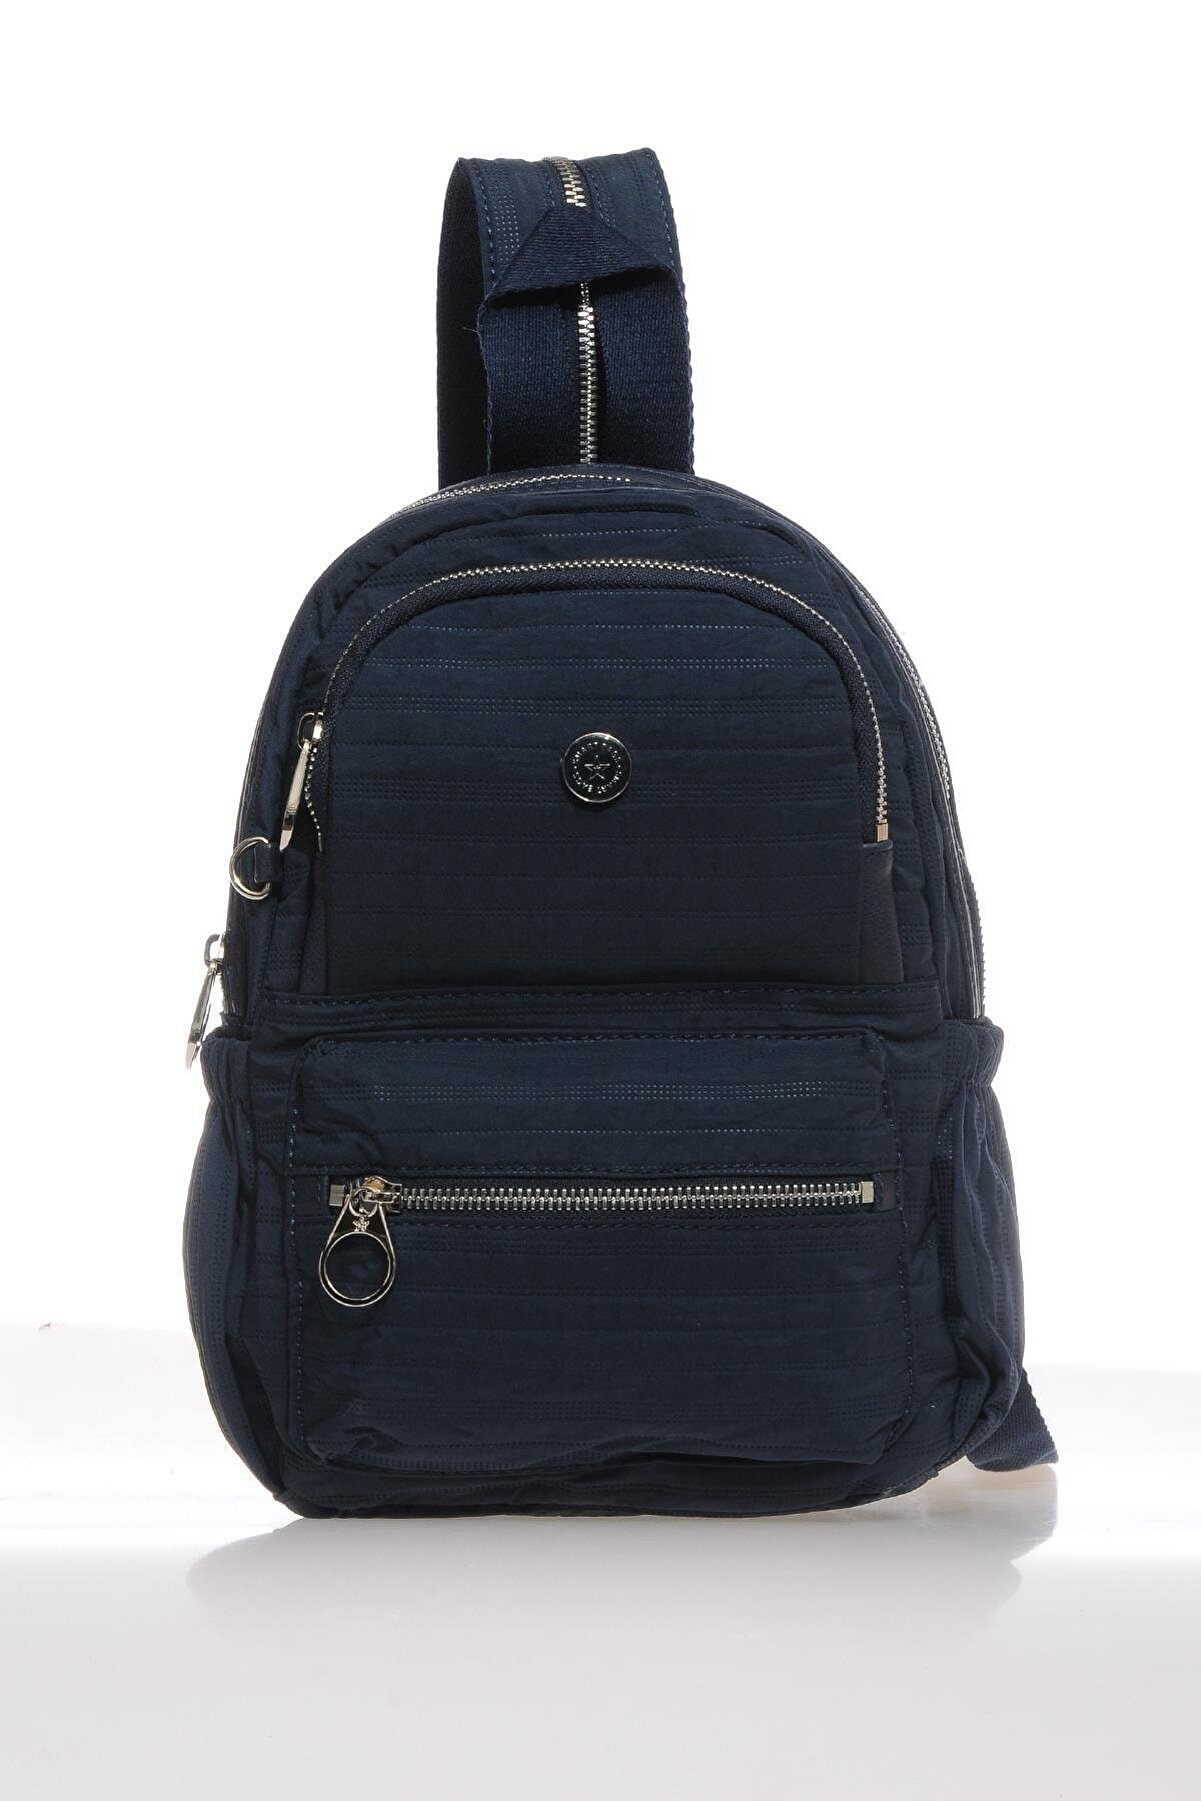 Smart Bags Smb3021-0033 Lacivert Kadın Sırt Çantası